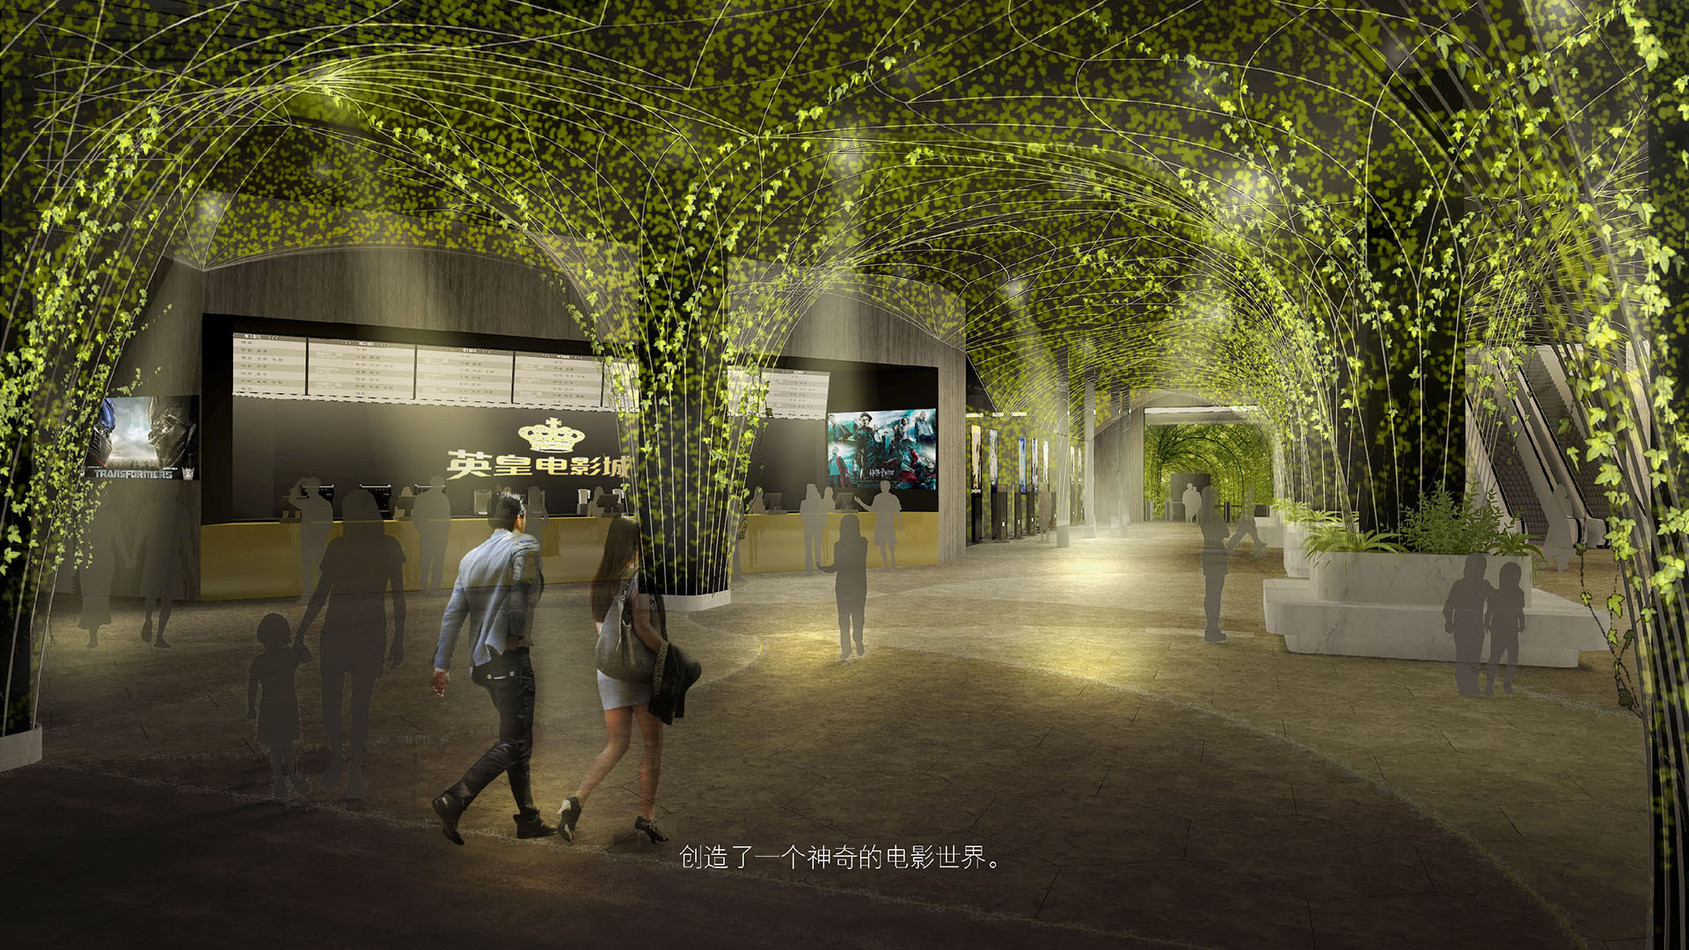 CHONGQING-EMPEROR-CINEMA-ZH 04.jpg